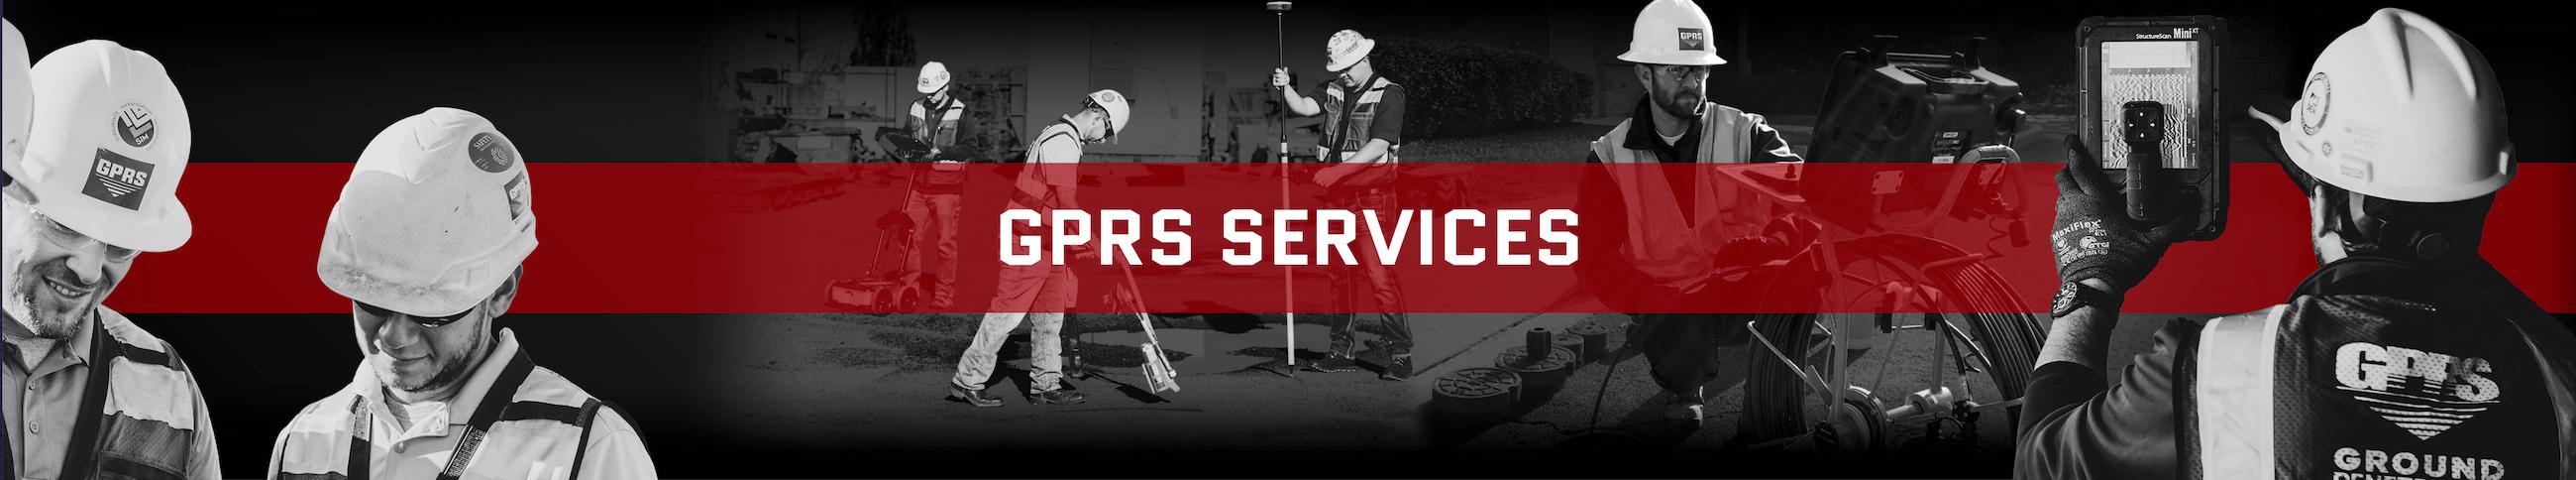 services-header.png